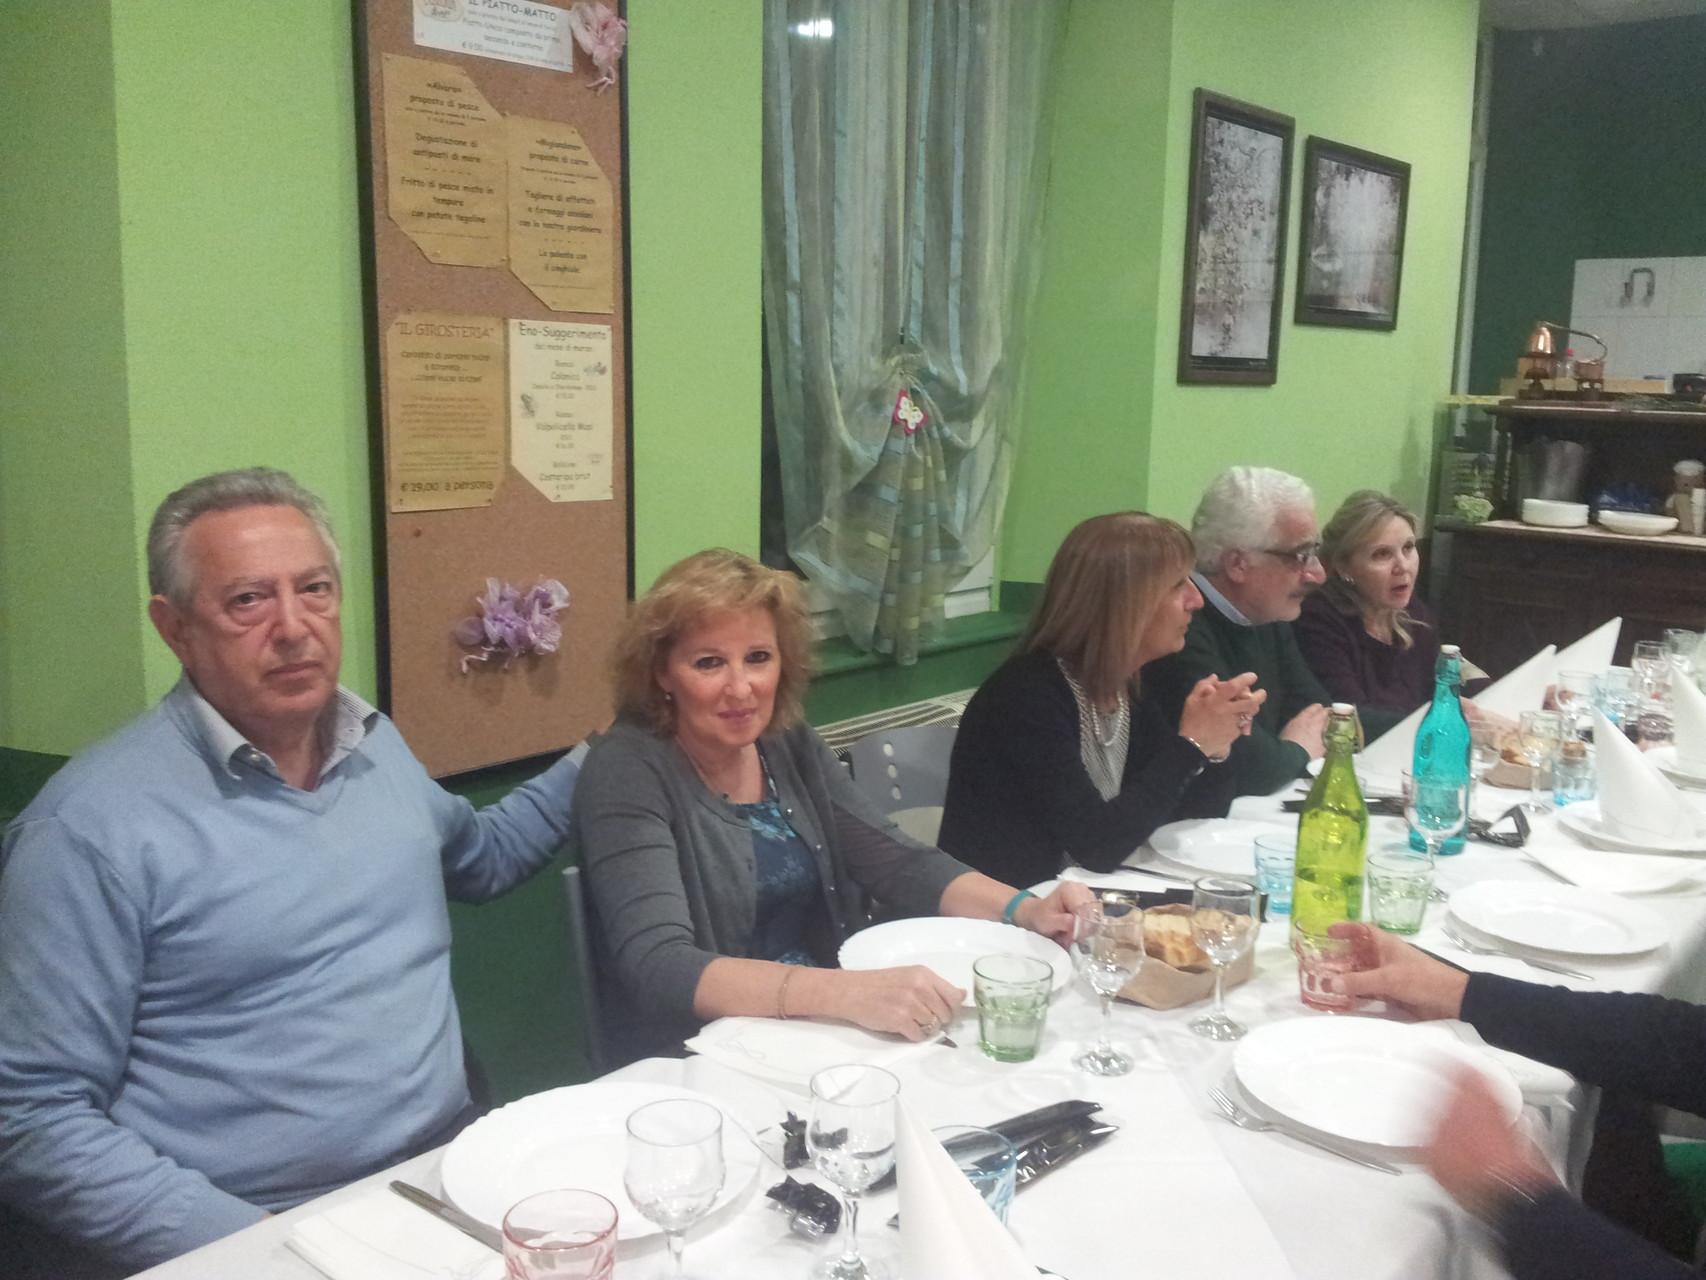 GABRIO, FLAVIA, GIUSI, GIORGIO, BARBARA